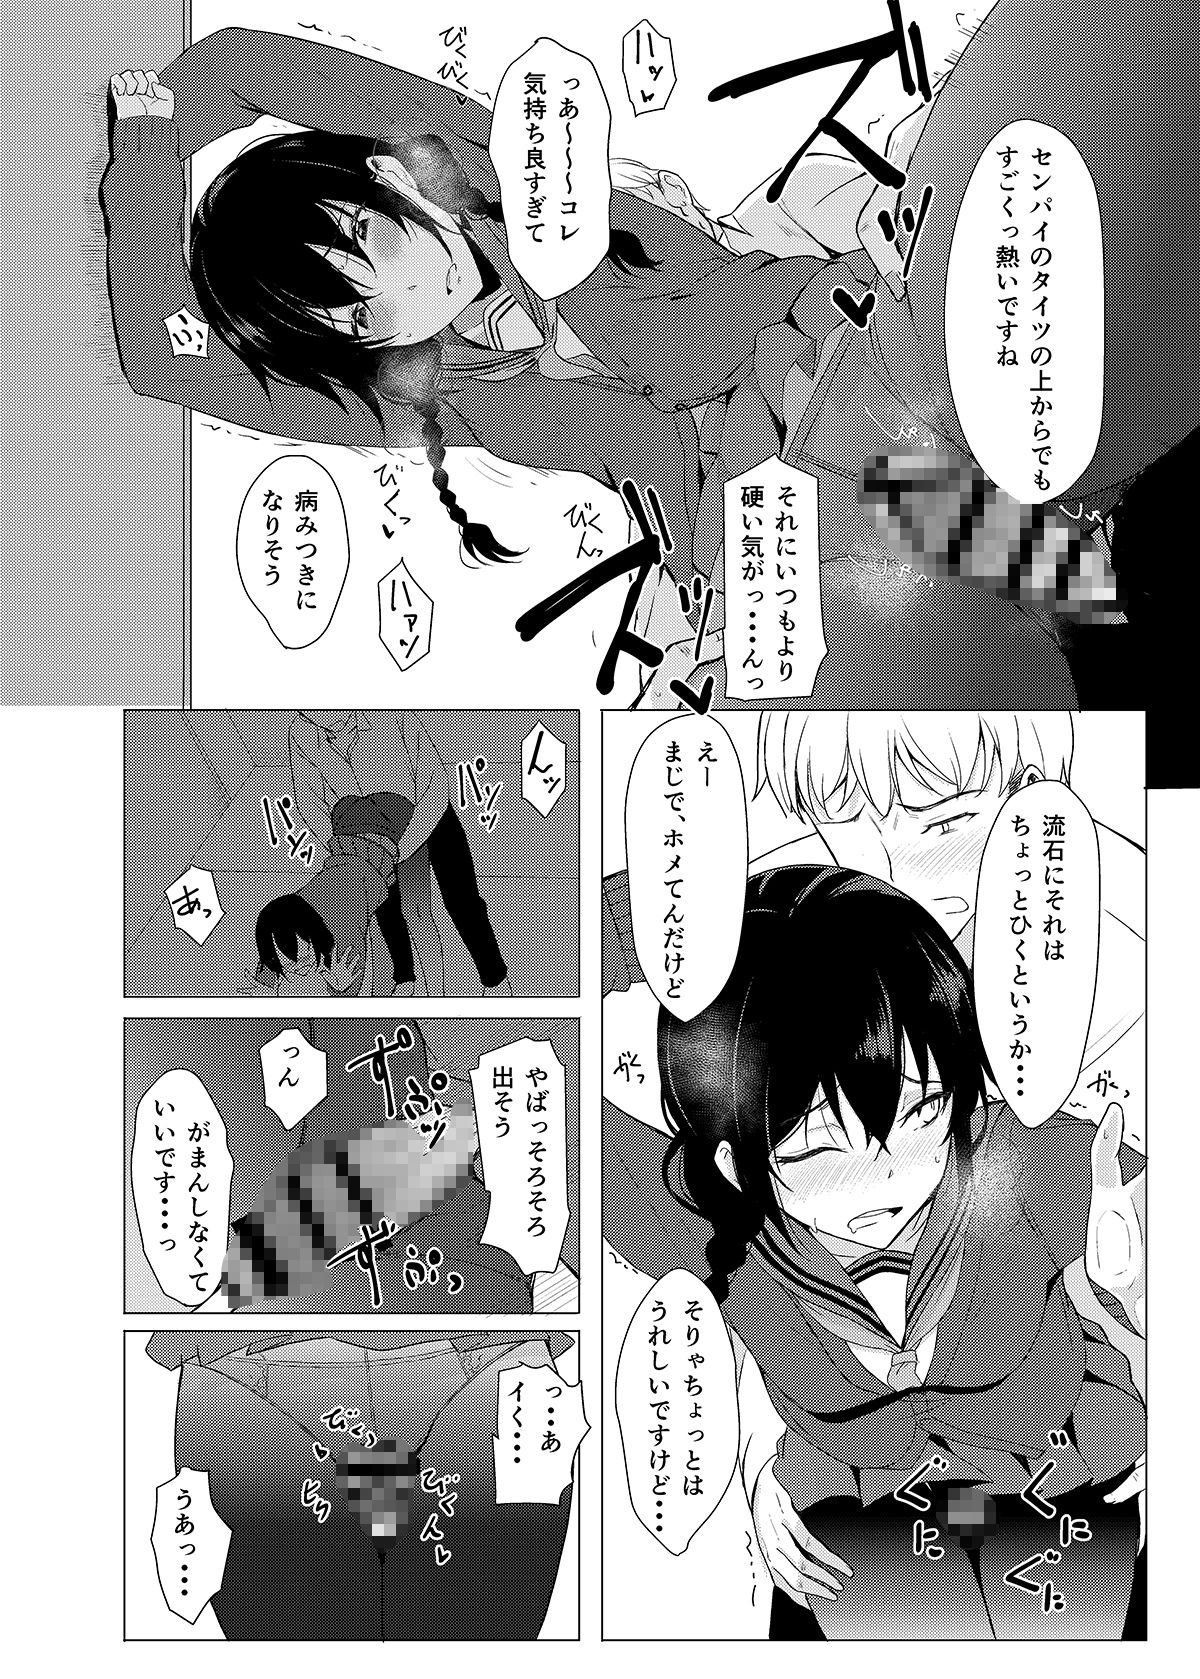 FANZA 同人【後輩ちゃんにエロいことされる本3】